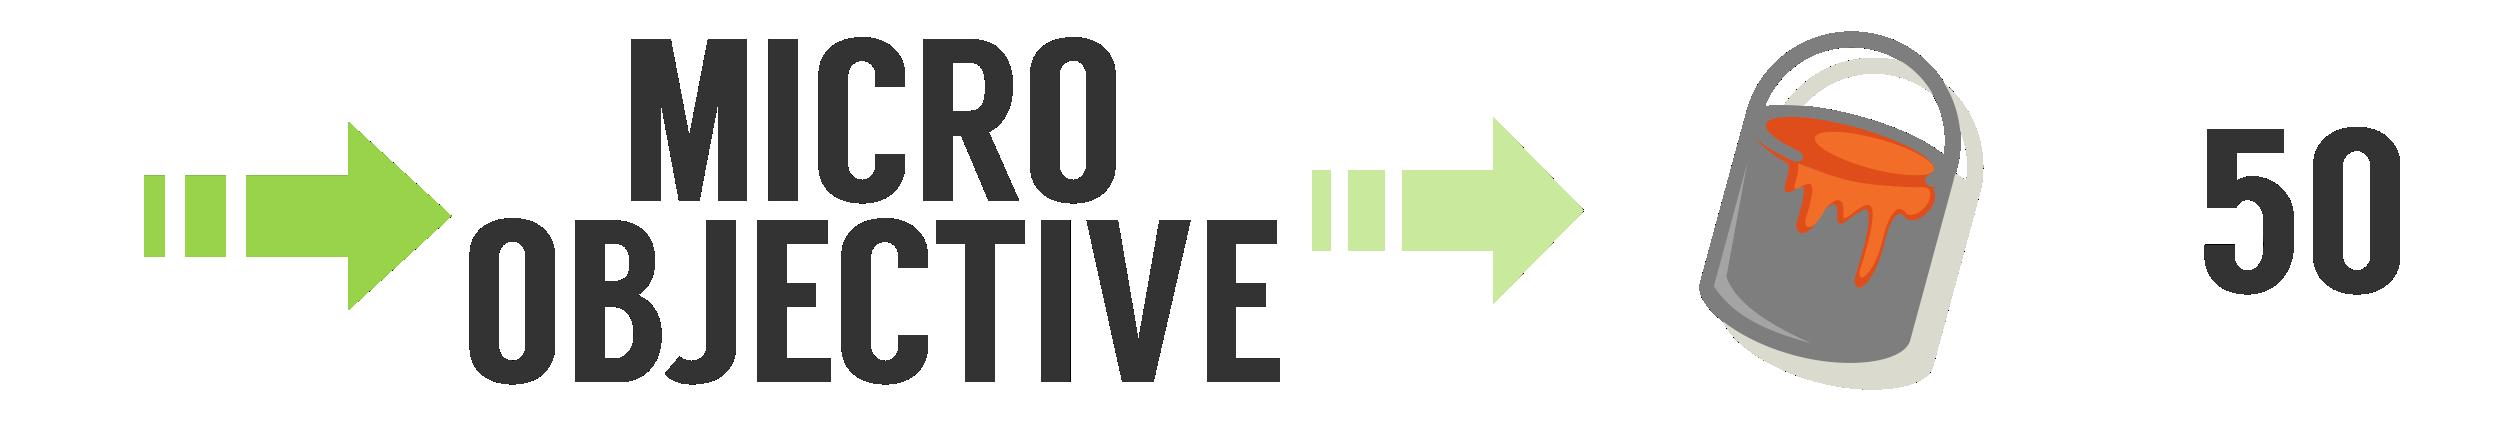 Micro Objective - Art - 50